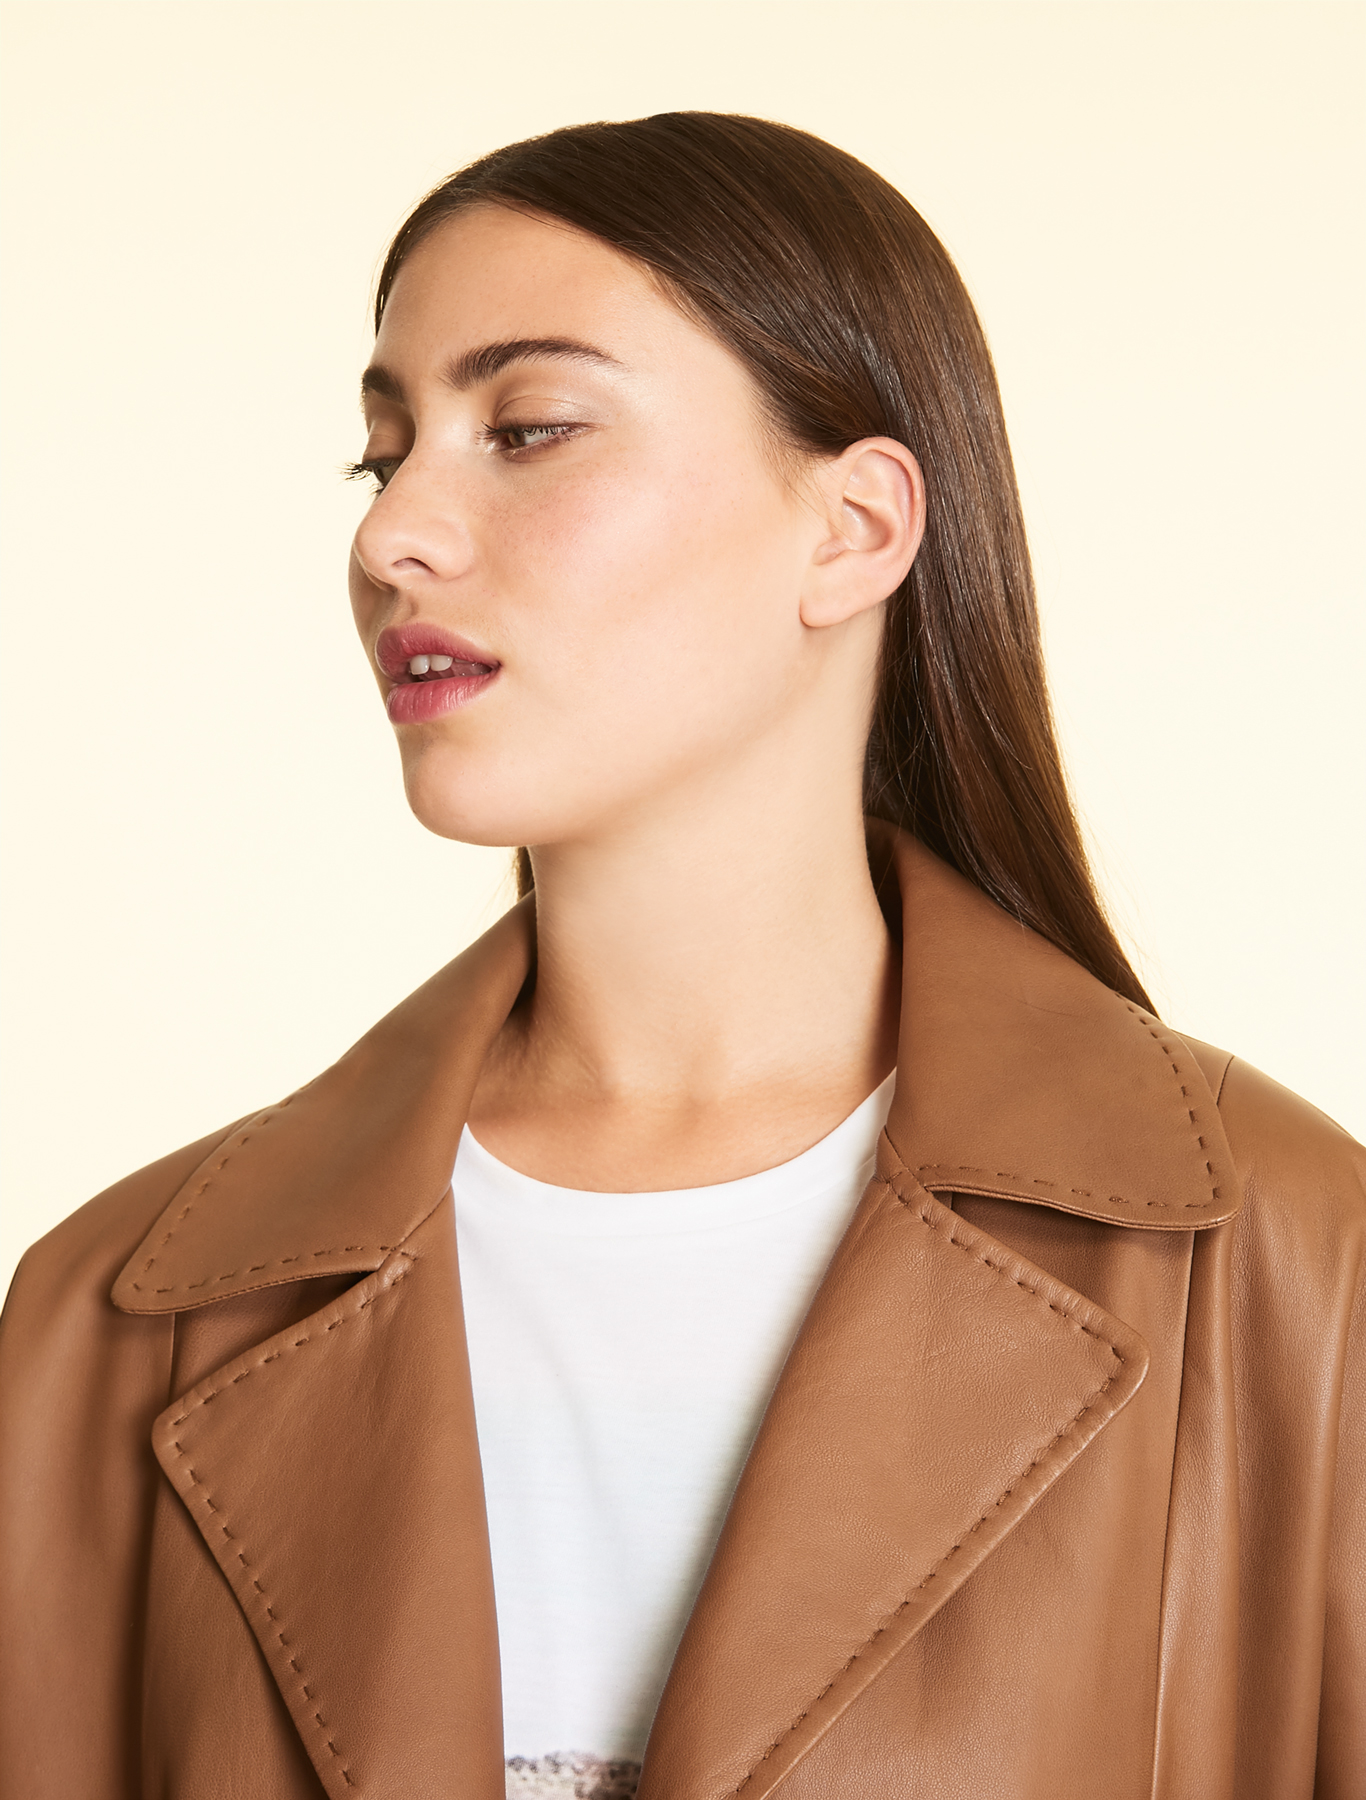 Matt nappa leather jacket, brown Marina Rinaldi